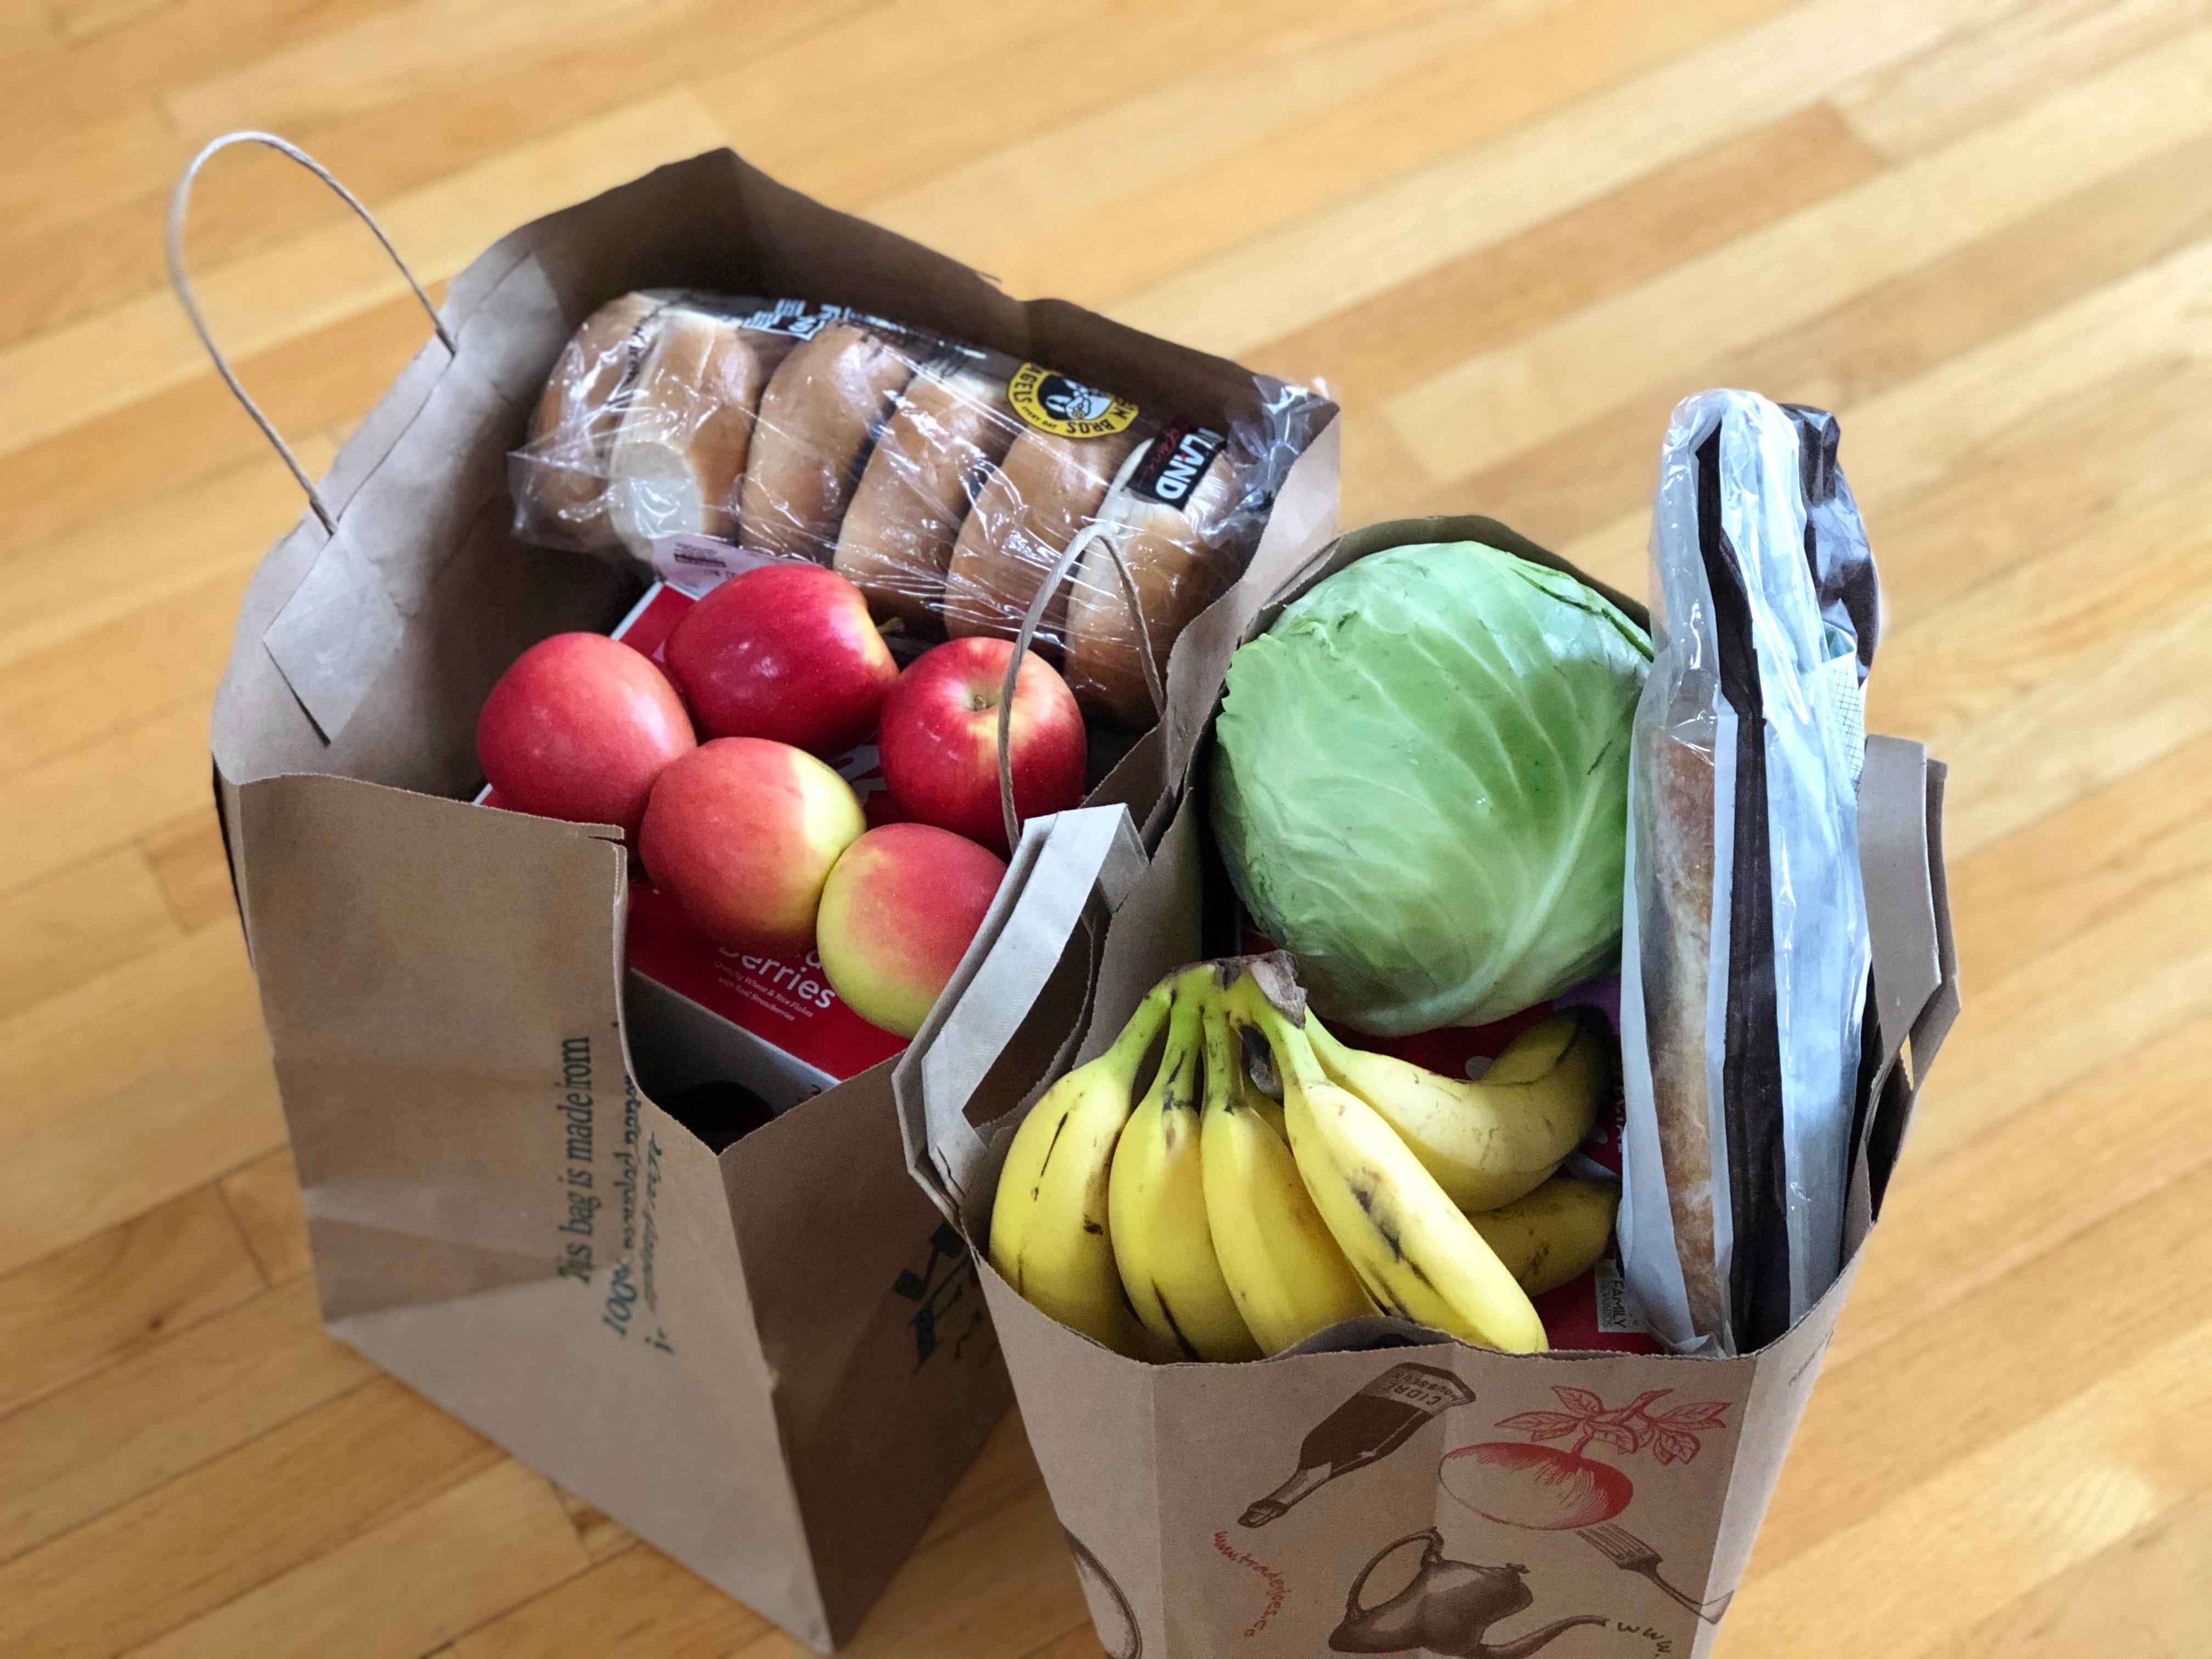 grocery order in brown paper bags